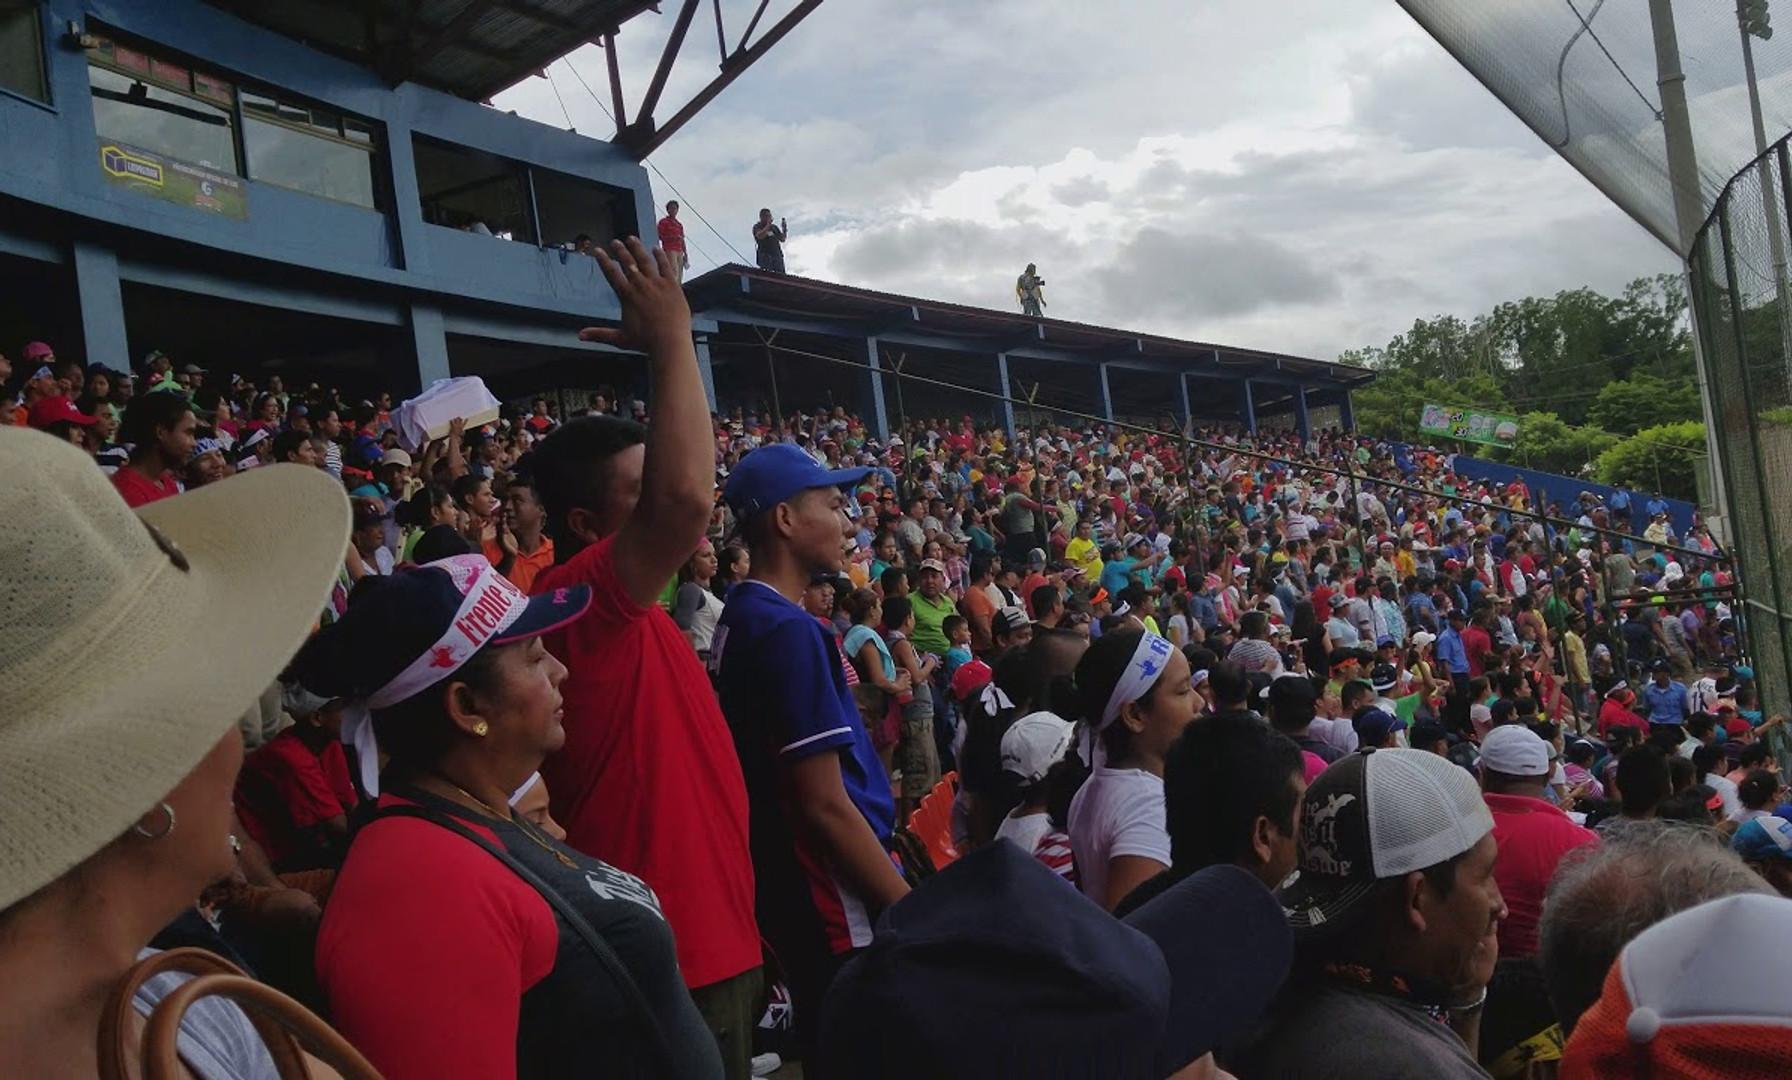 Stadium Sounds: Go Ahead Run by Frente Sur in POMARES World Series, Frente Sur vs. Leon in Rivas, Nicaragua